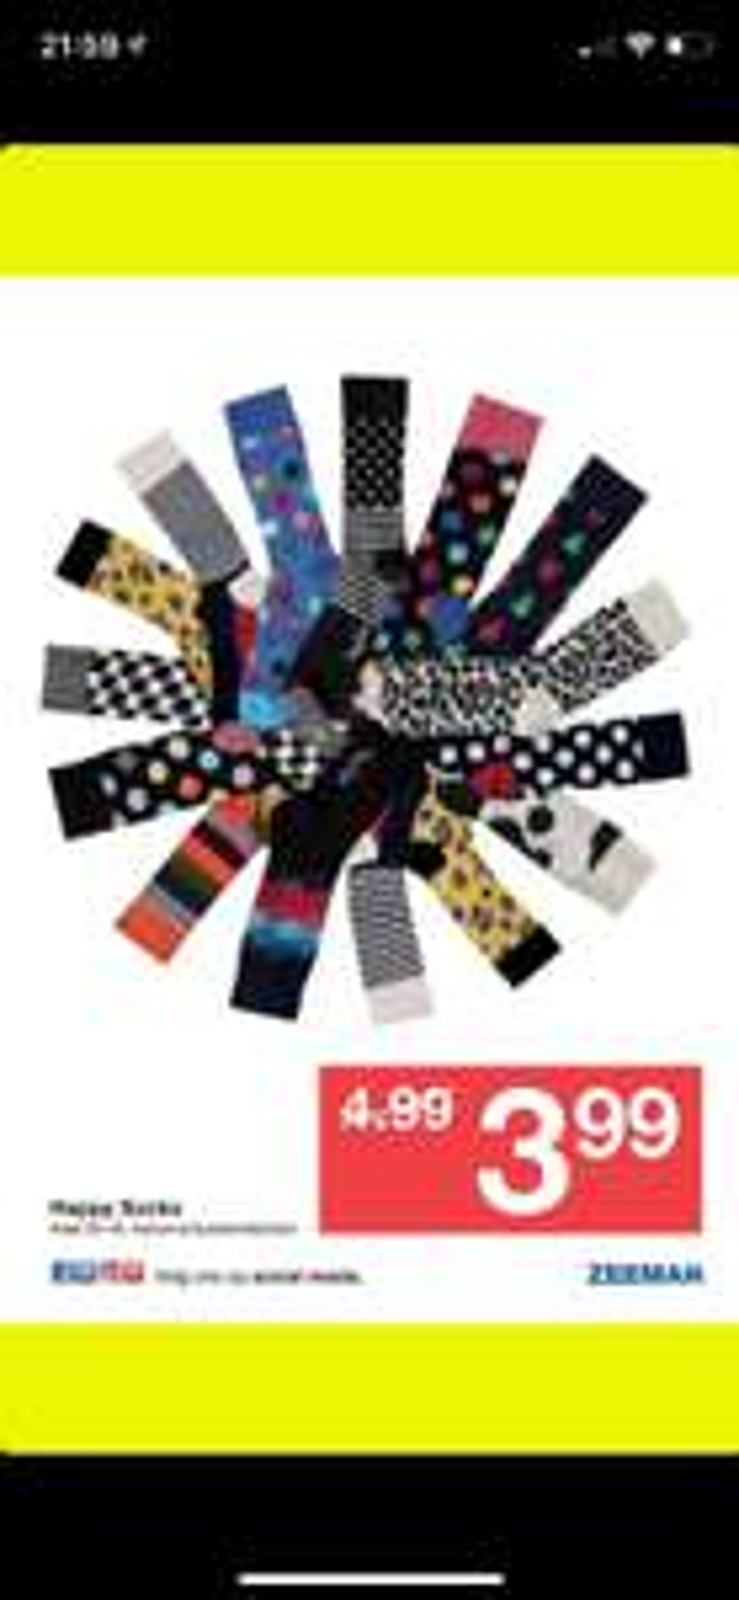 Happy socks 3.99 zeeman